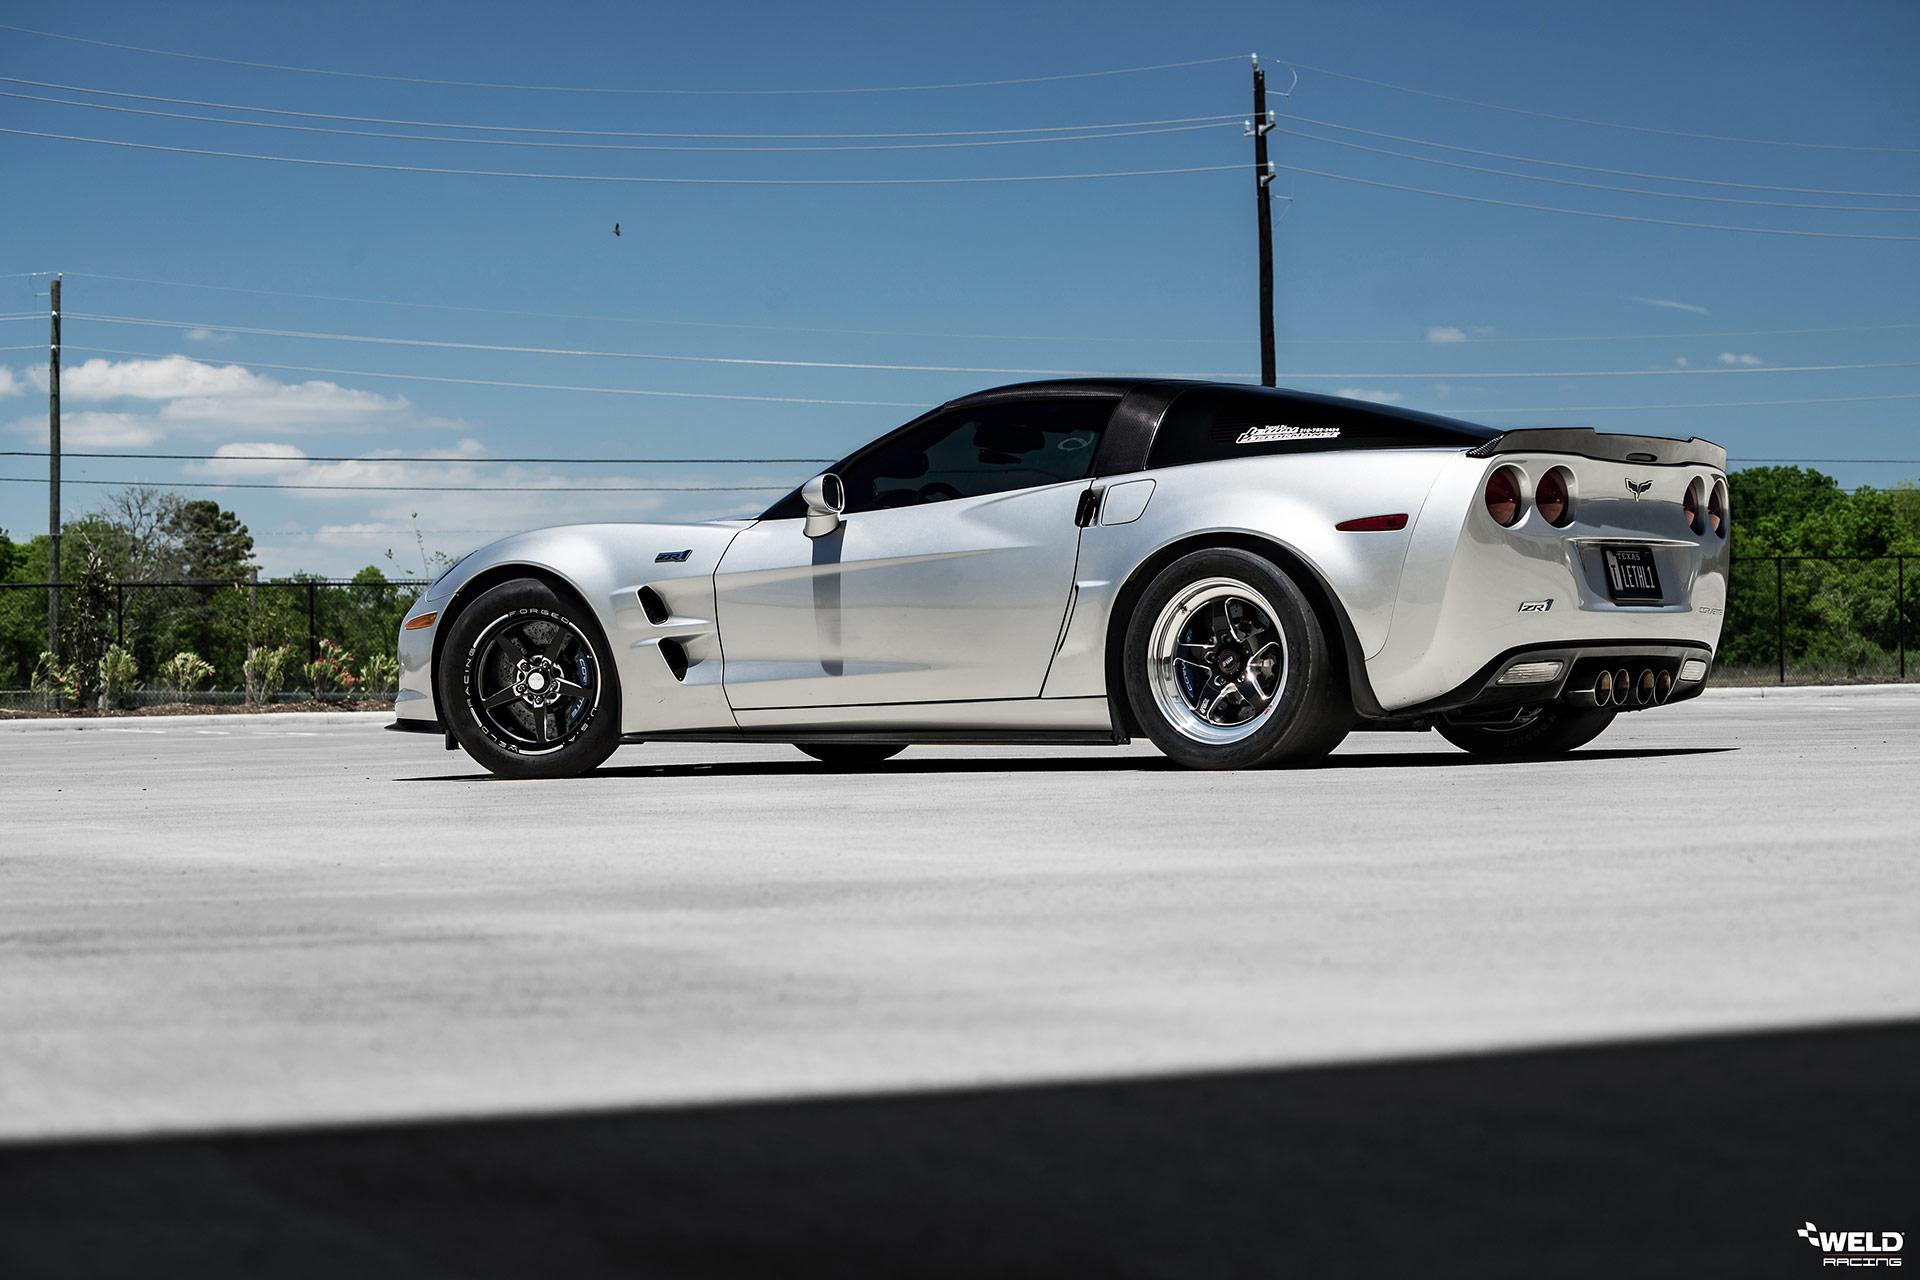 Silver Chevrolet C6 ZR1 Corvette - WELD S71 & WELD Alumastar Wheels